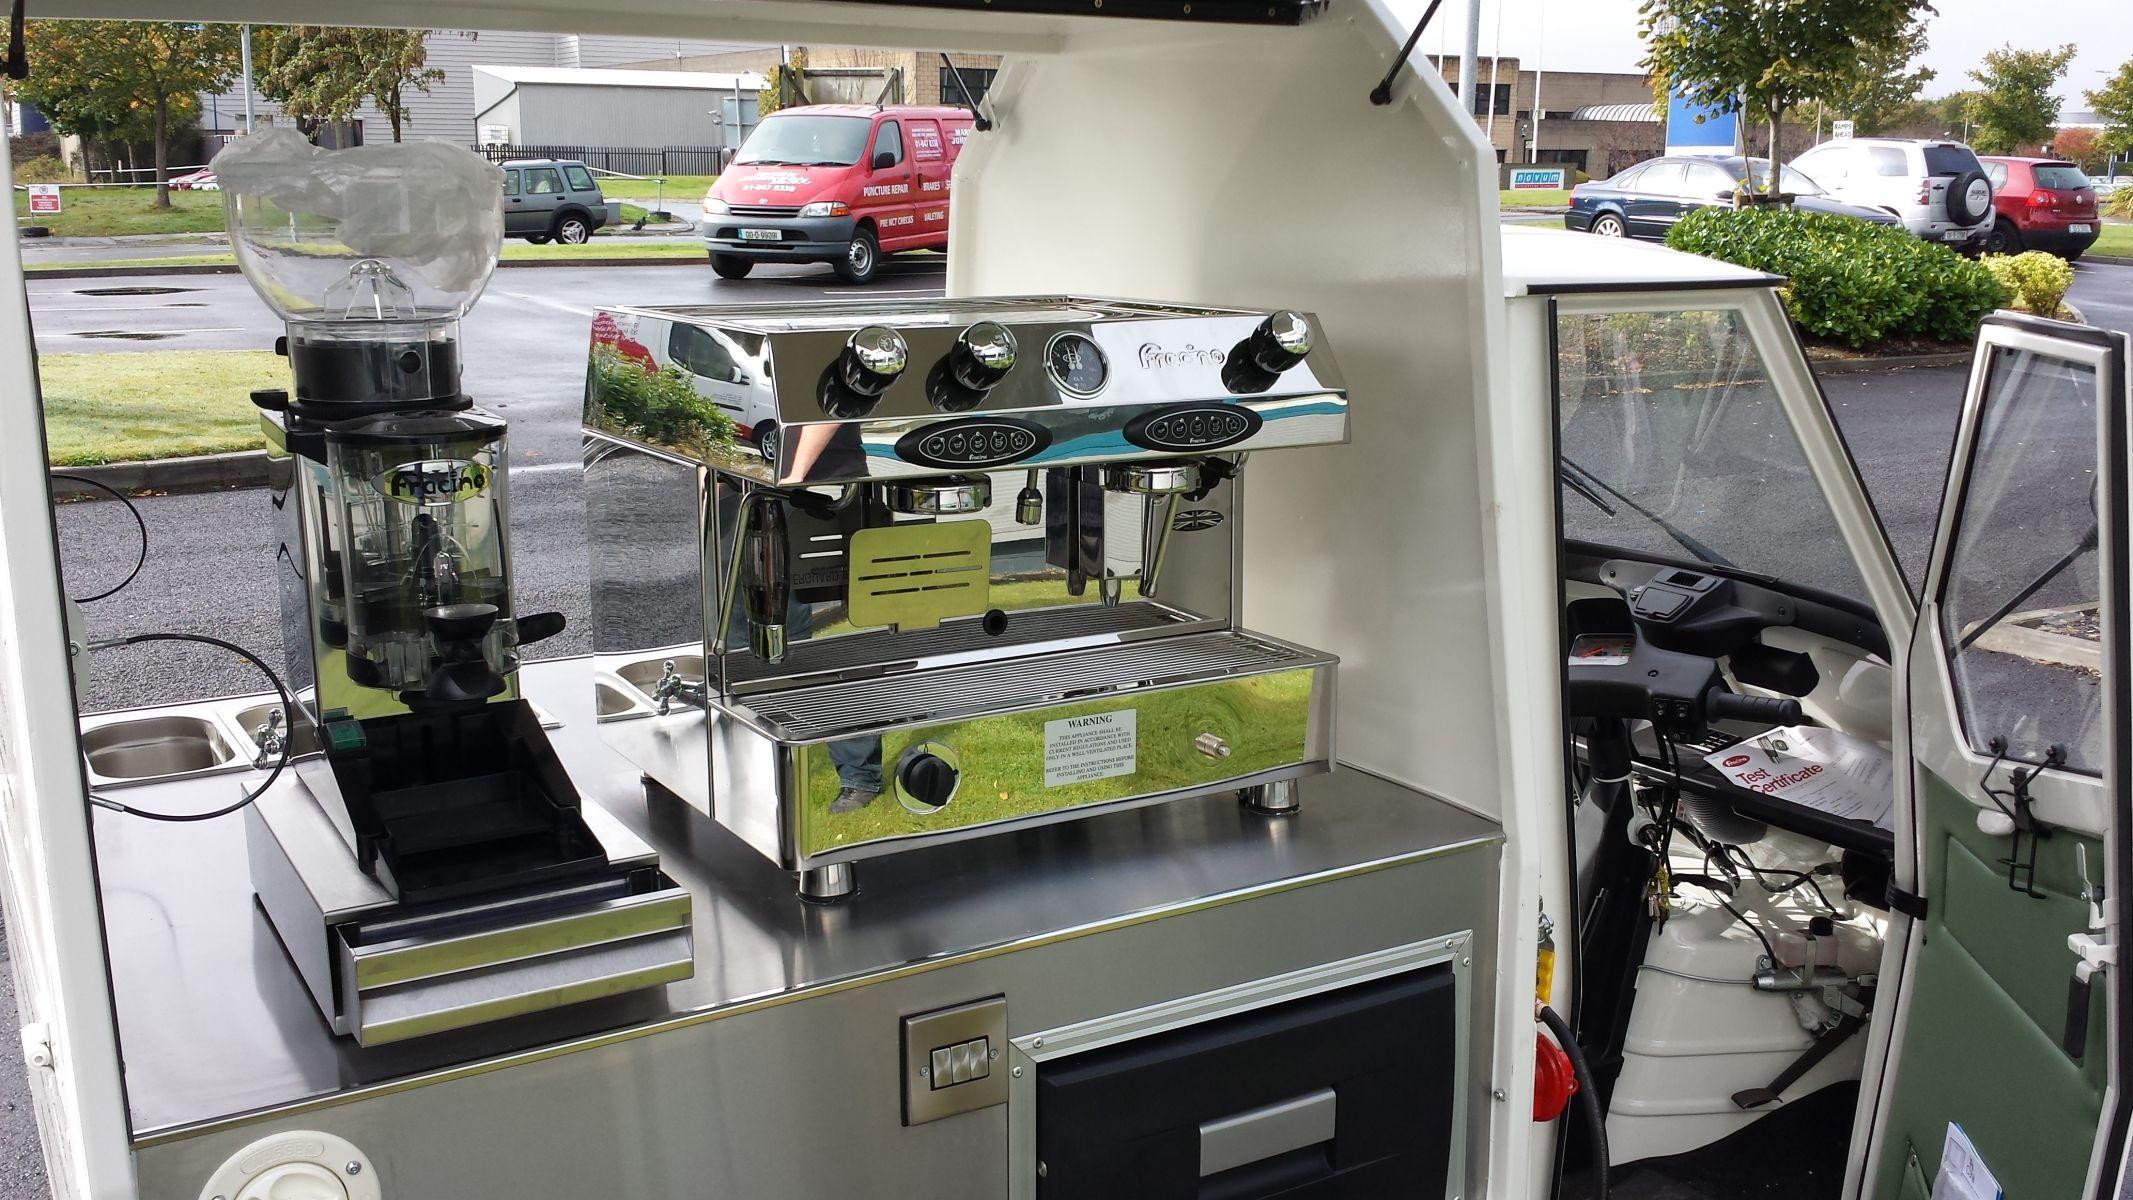 Pin by Jørgen Klitholm on CoffeApe Coffee truck, Coffee